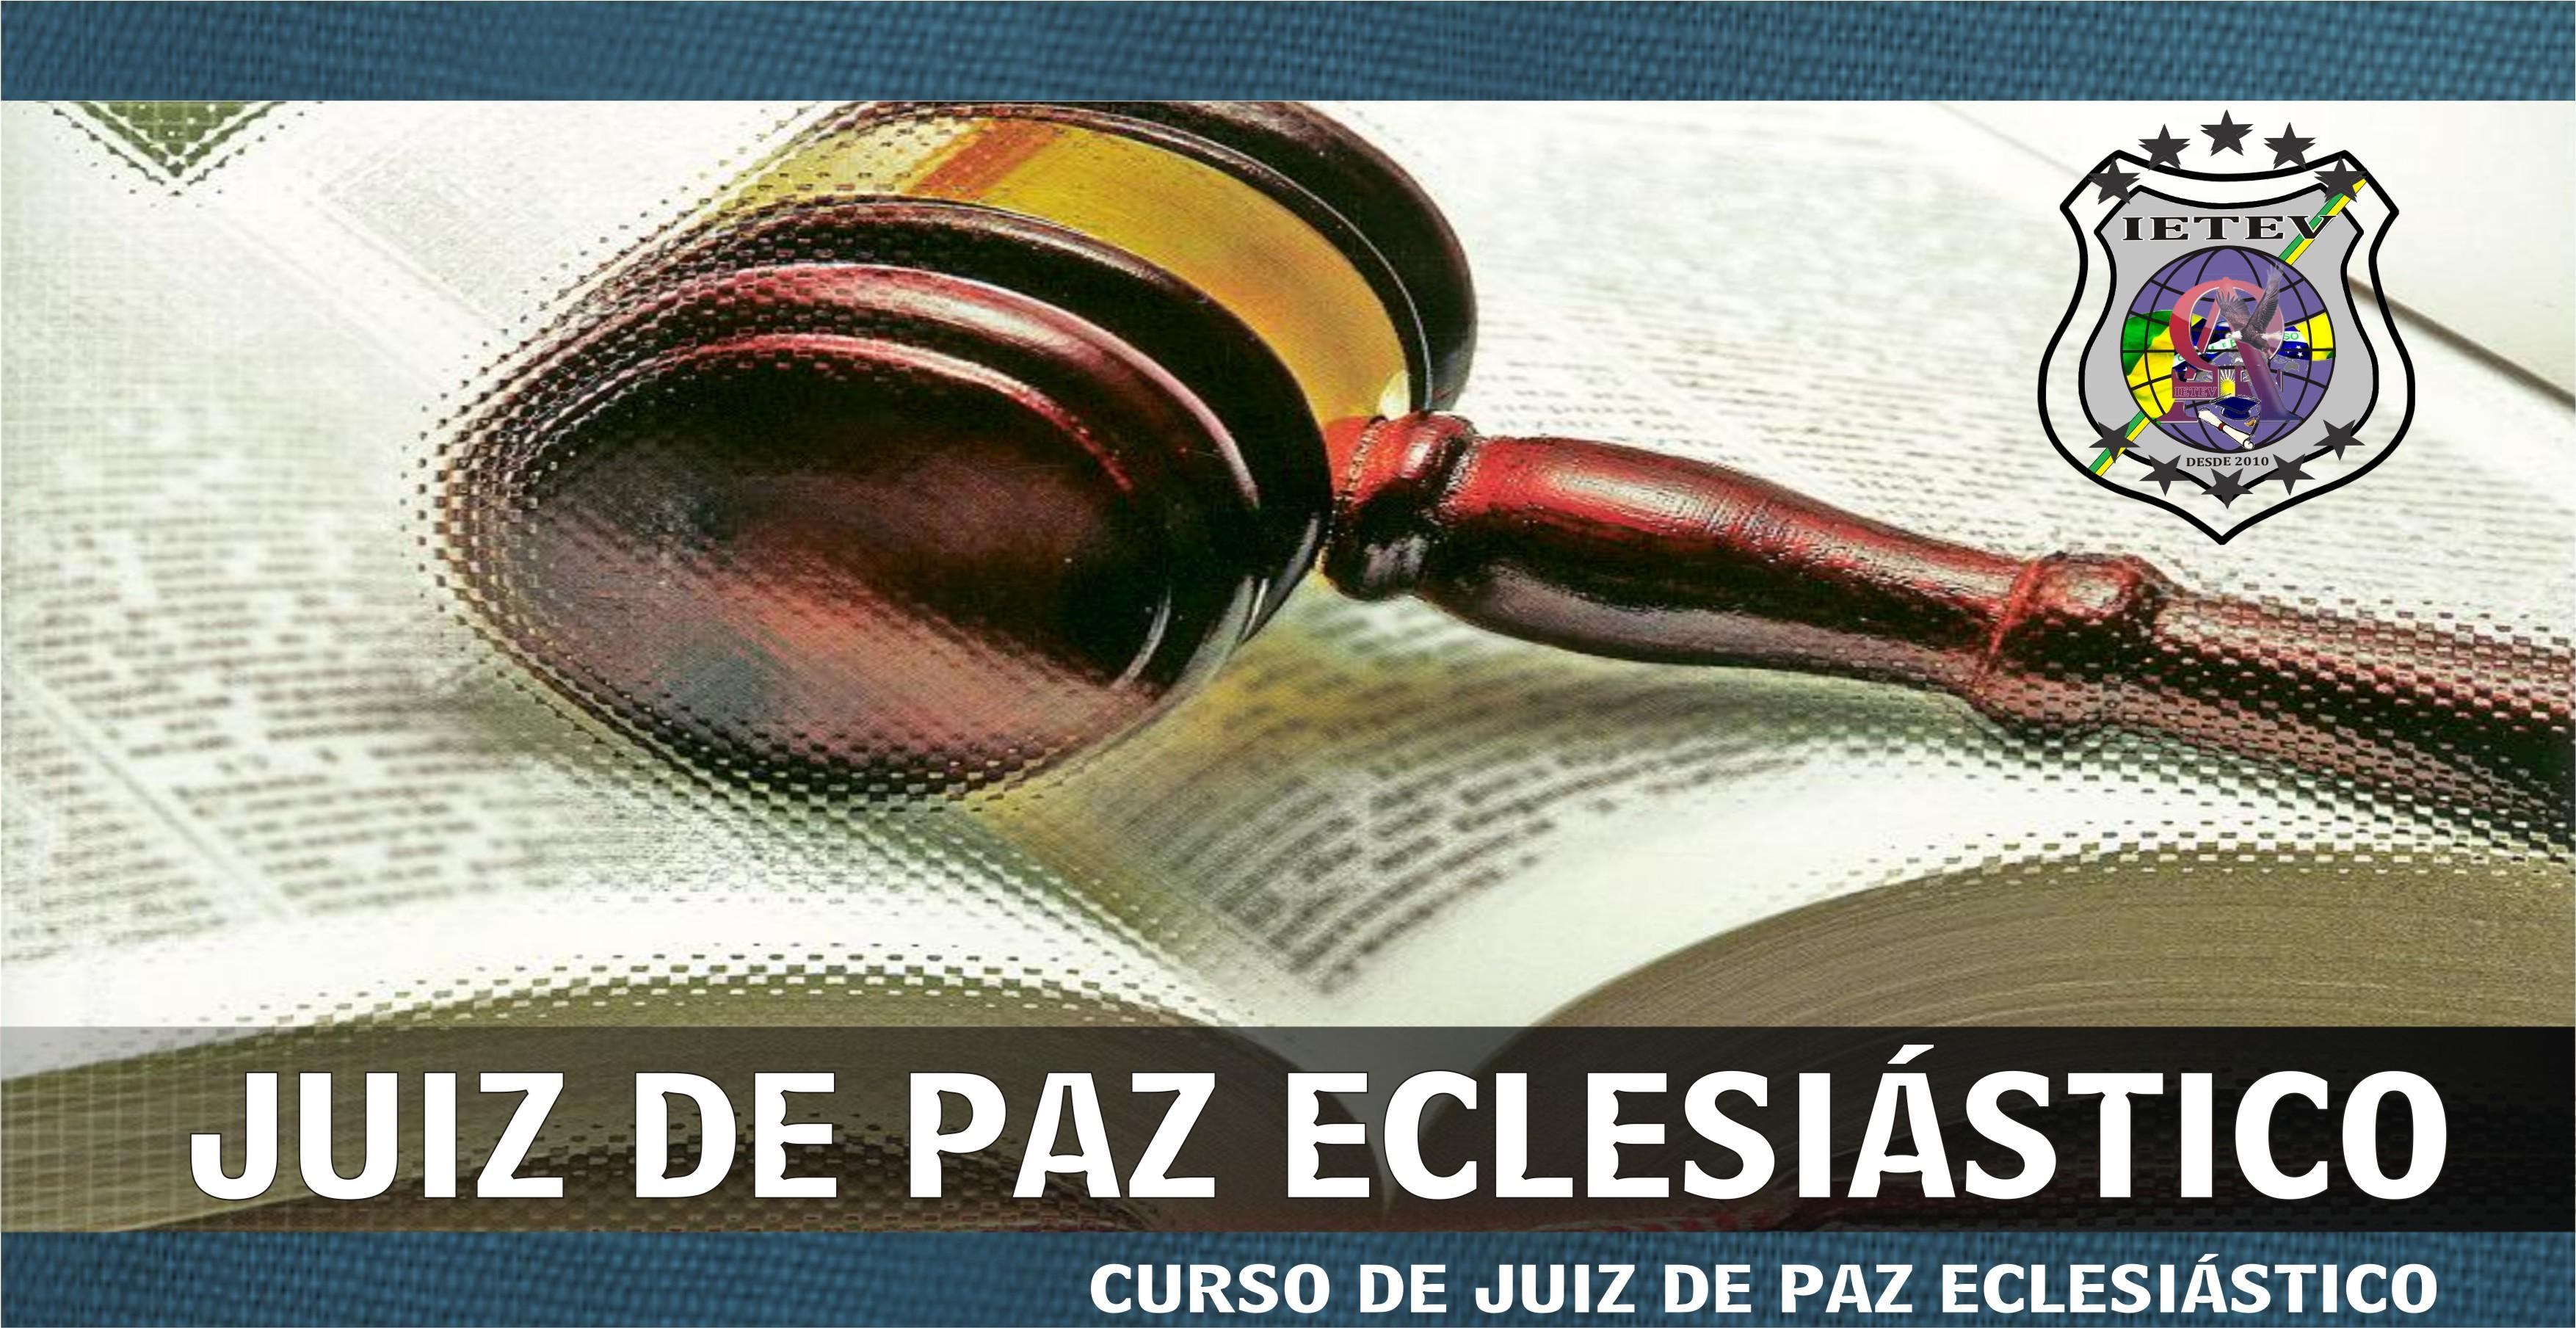 JUIZ DE PAZ ECLESIÁSTICO